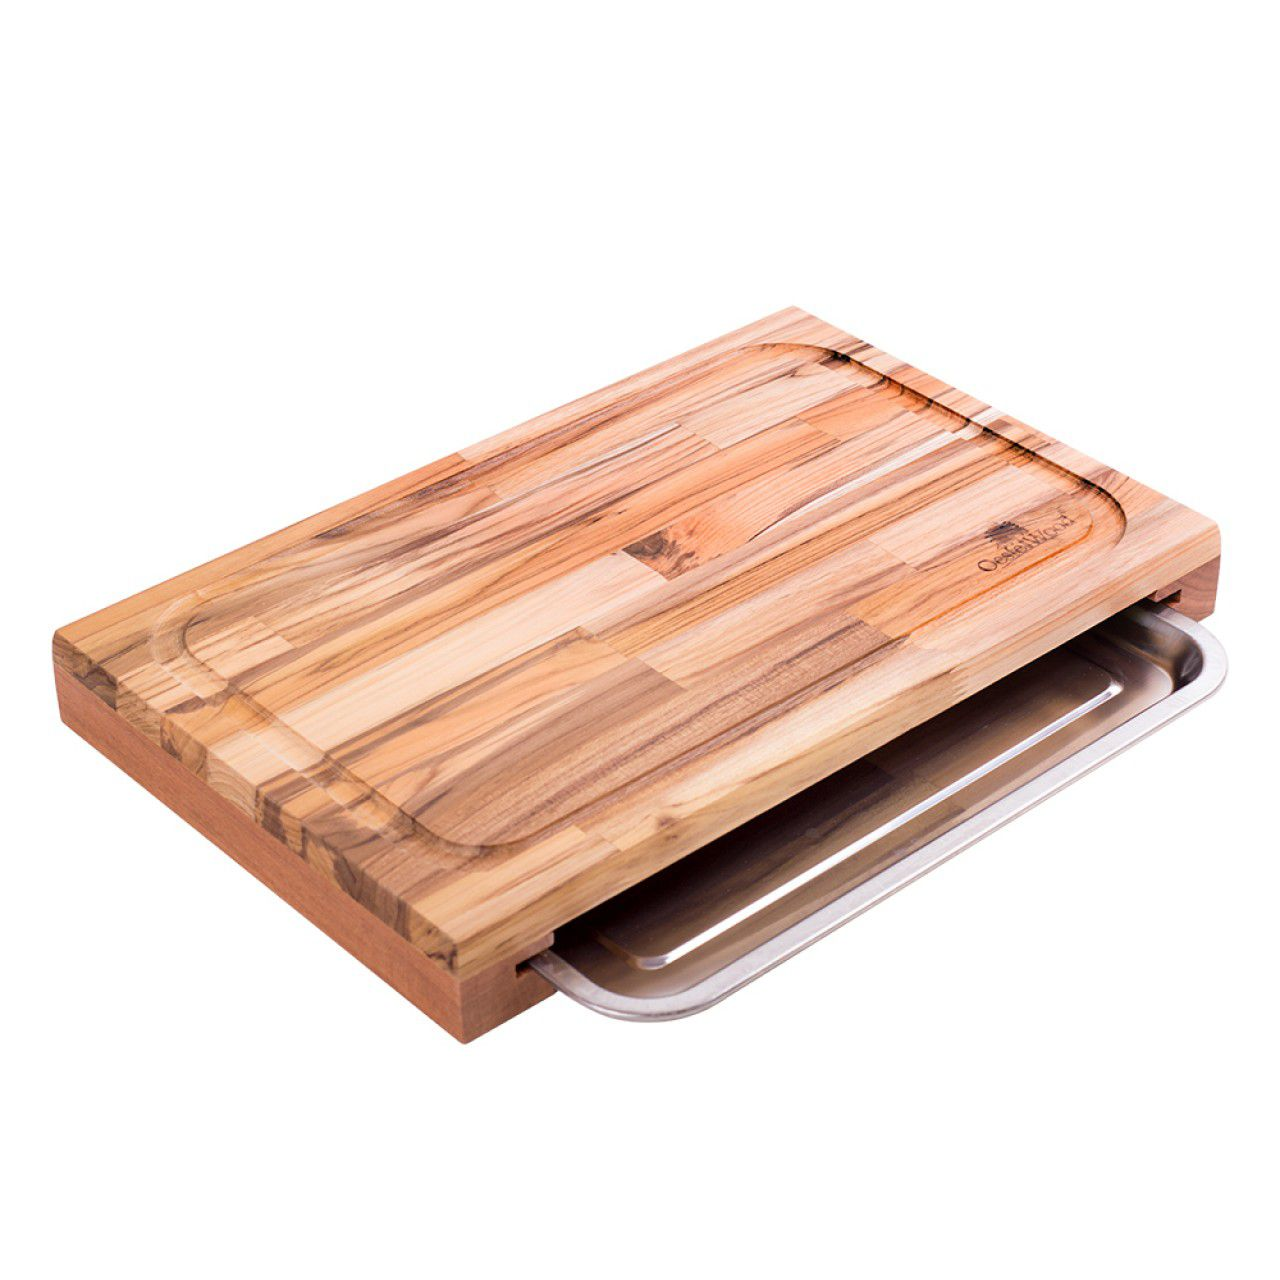 Tabua com Bandeja Churrasco Teka - Oeste Wood 48x30,5x5cm